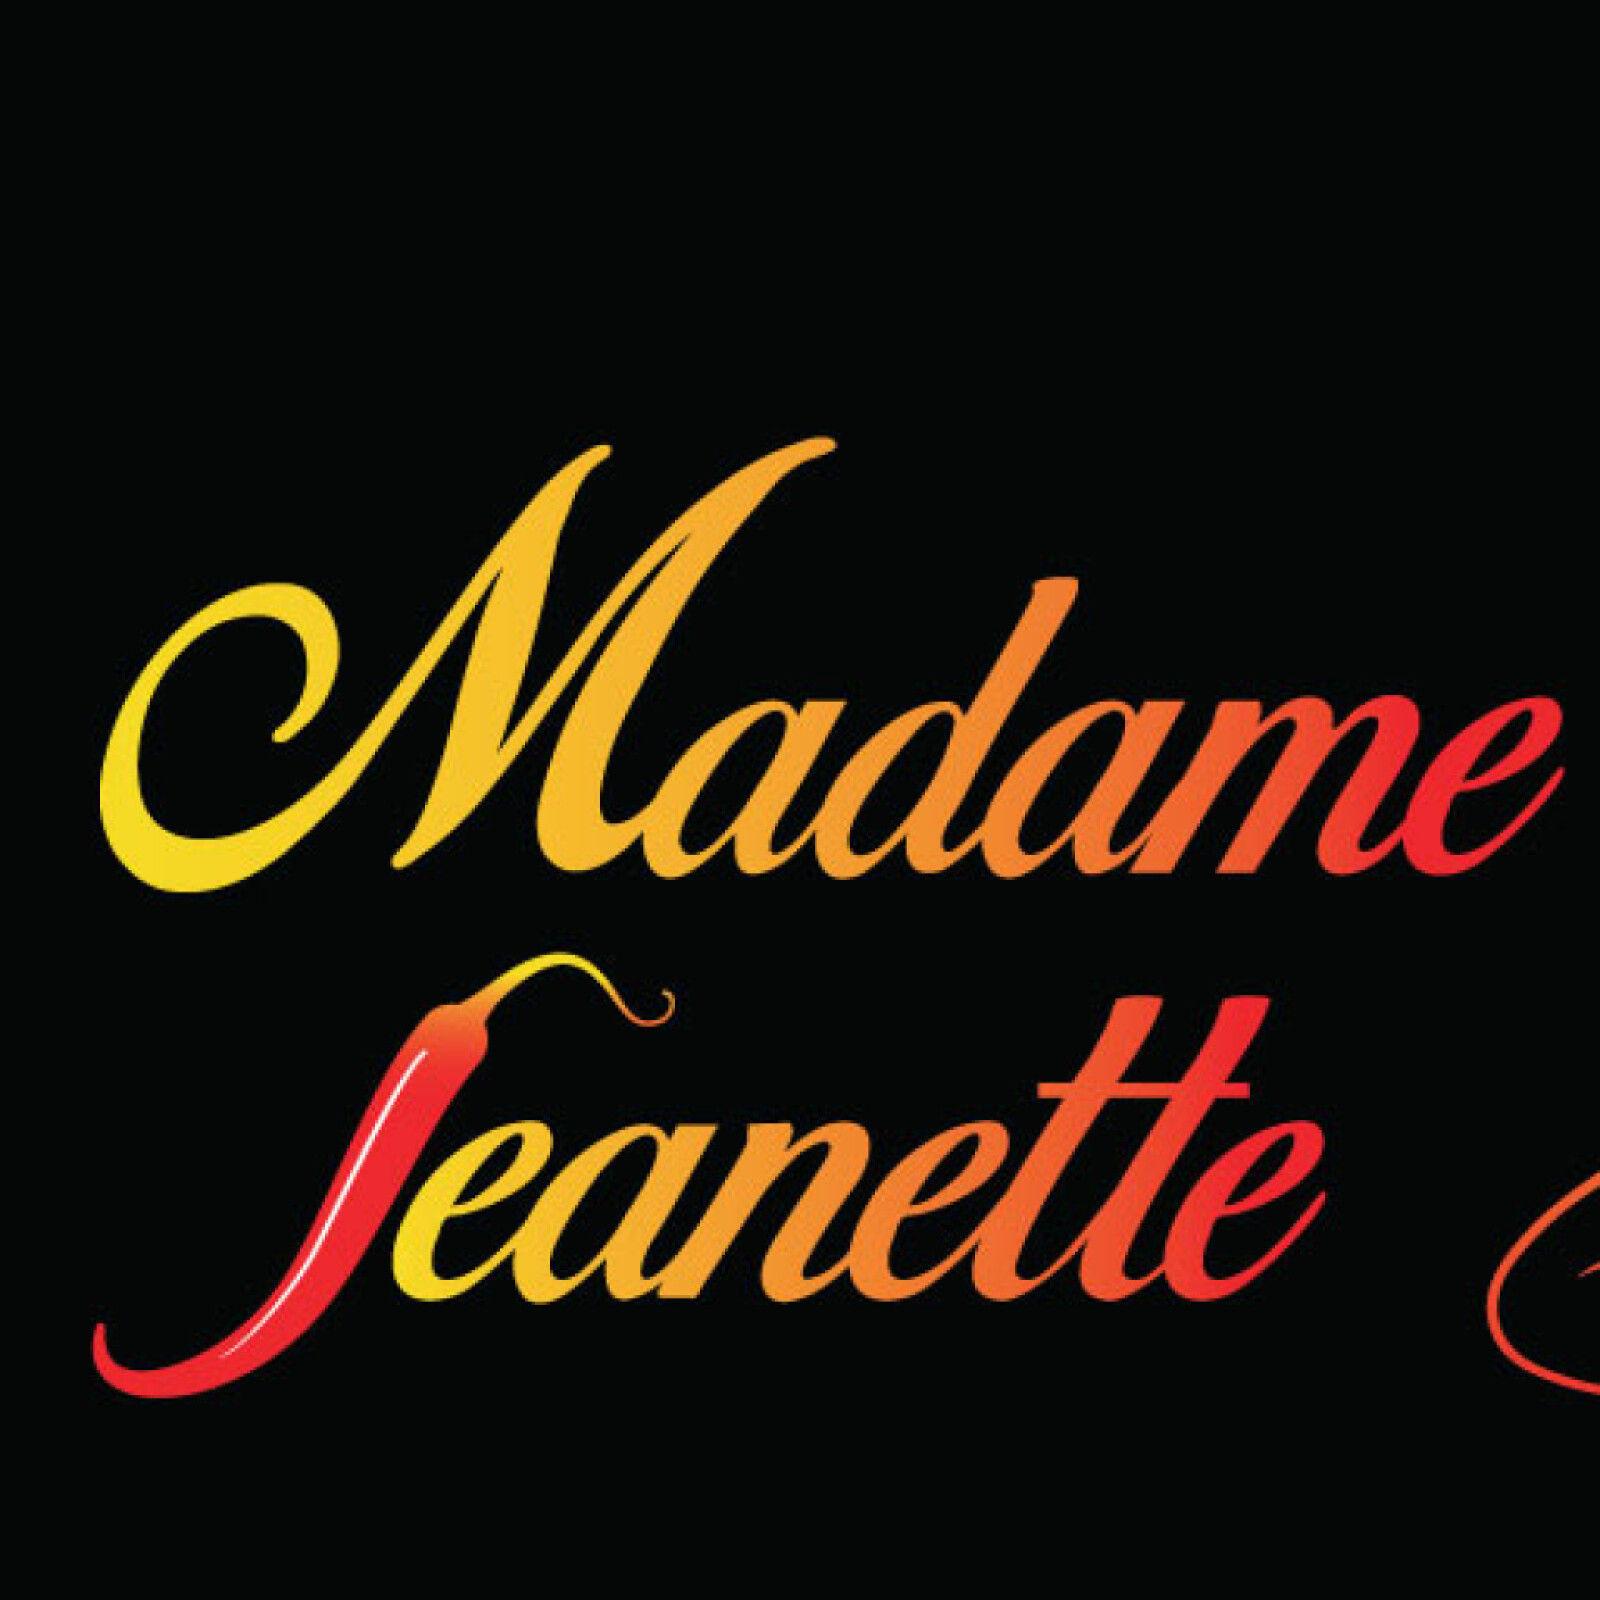 madame-jeanette